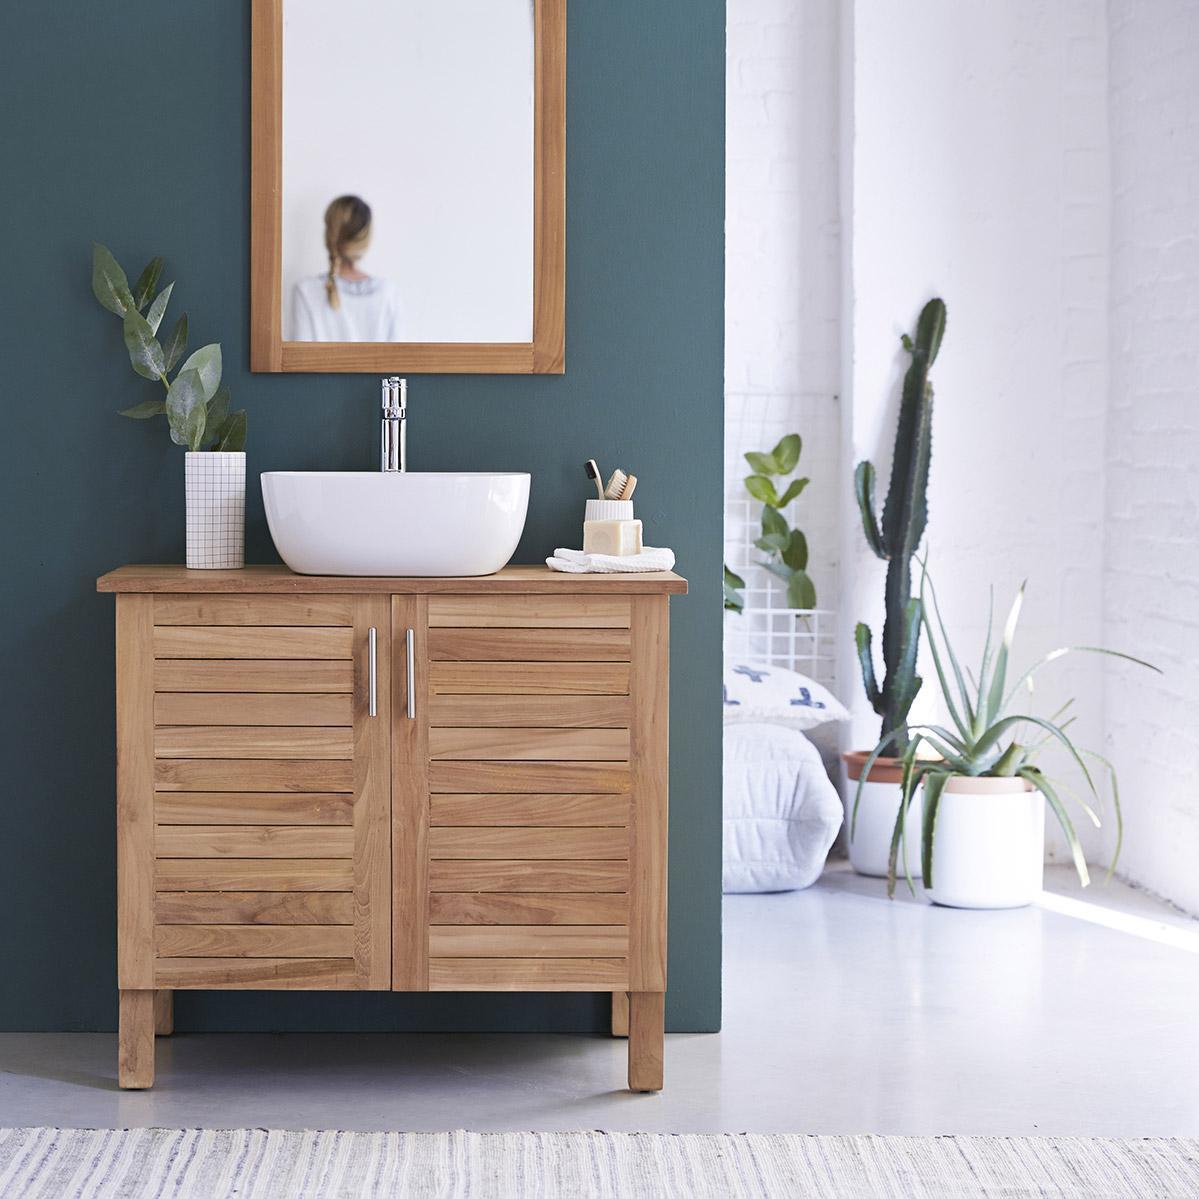 Meuble simple vasque l.85 x H.75 x P.55 cm, teck, Soho